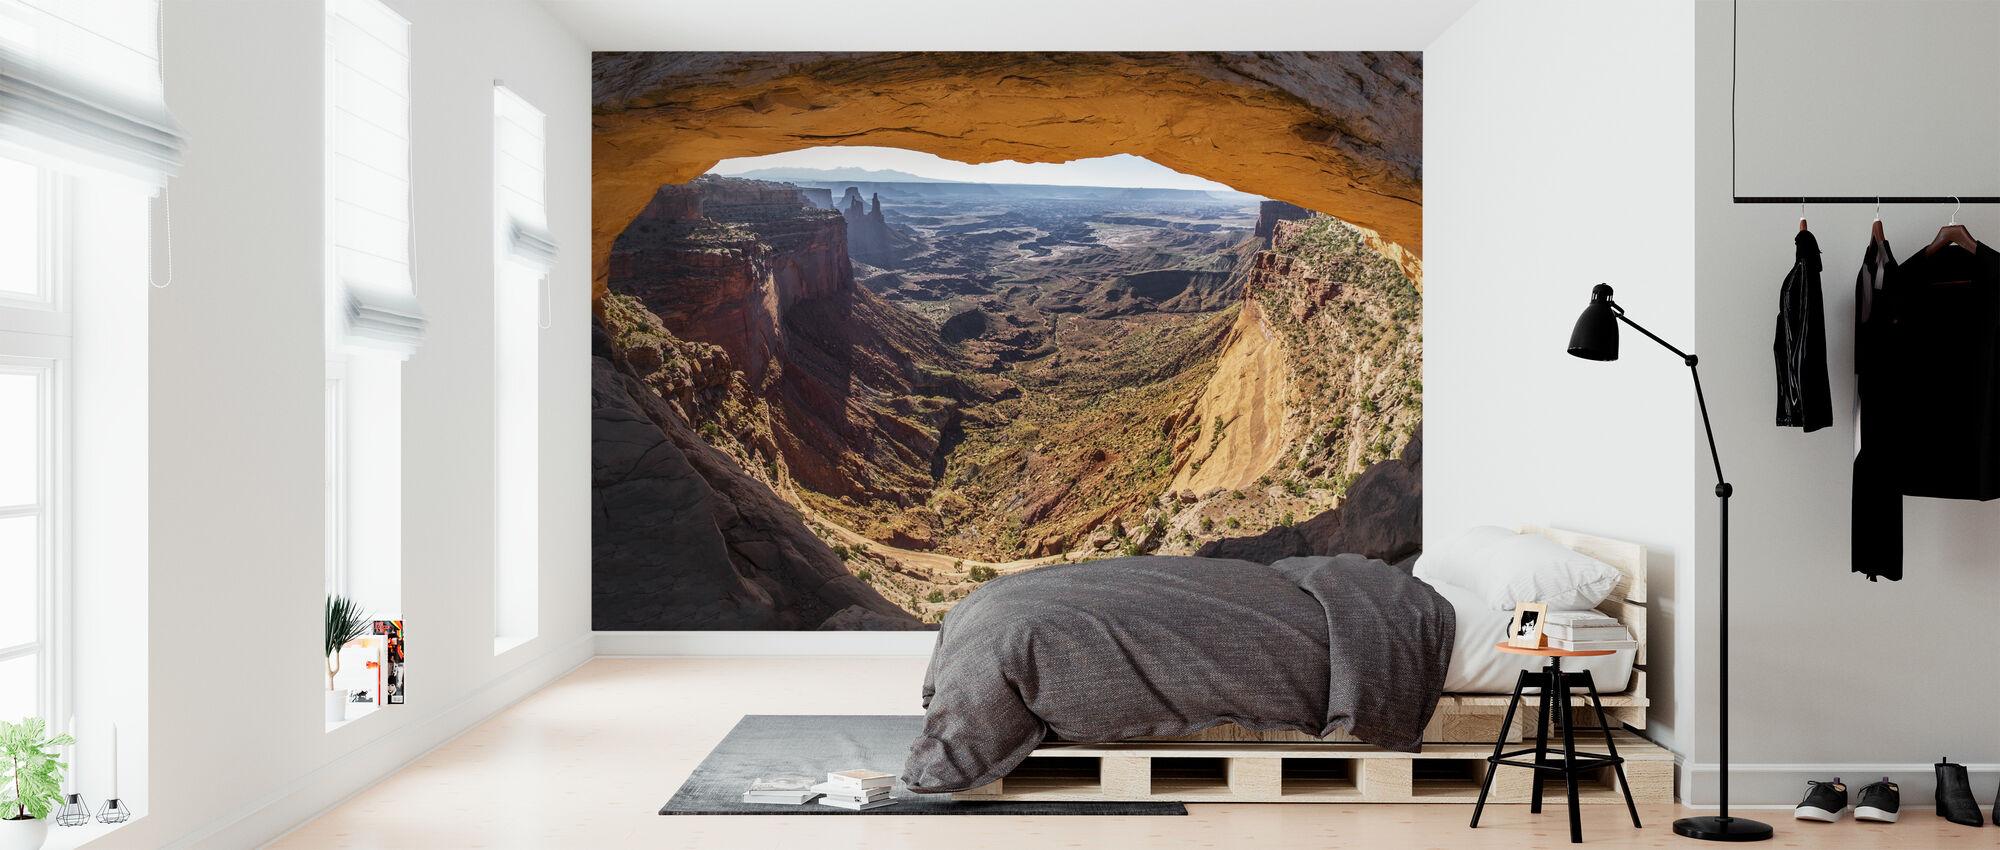 Mesa Arch - Tapet - Soverom